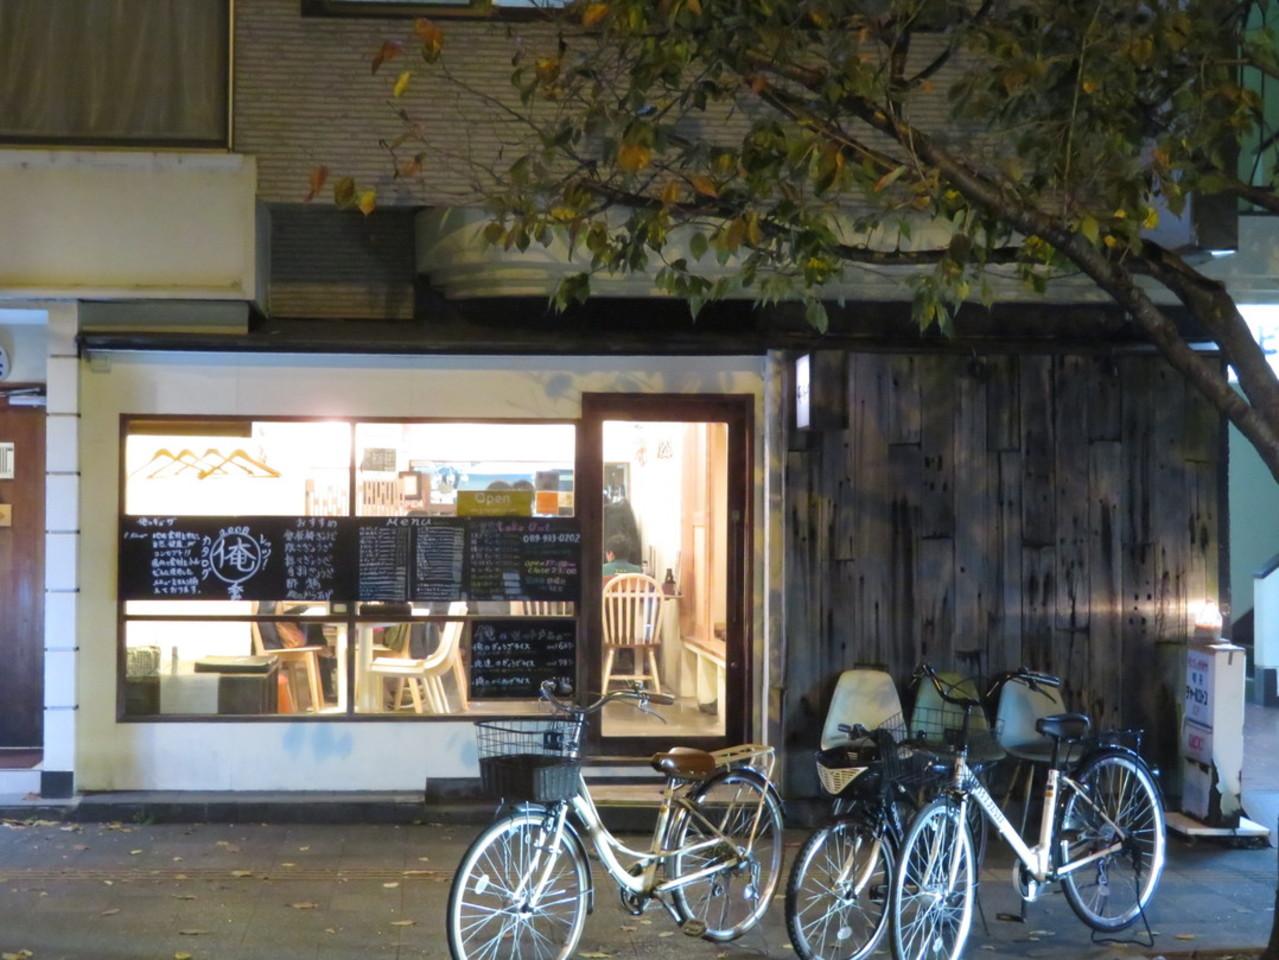 JR松山駅前で餃子と唐揚げと言えば、『俺のギョーザ』